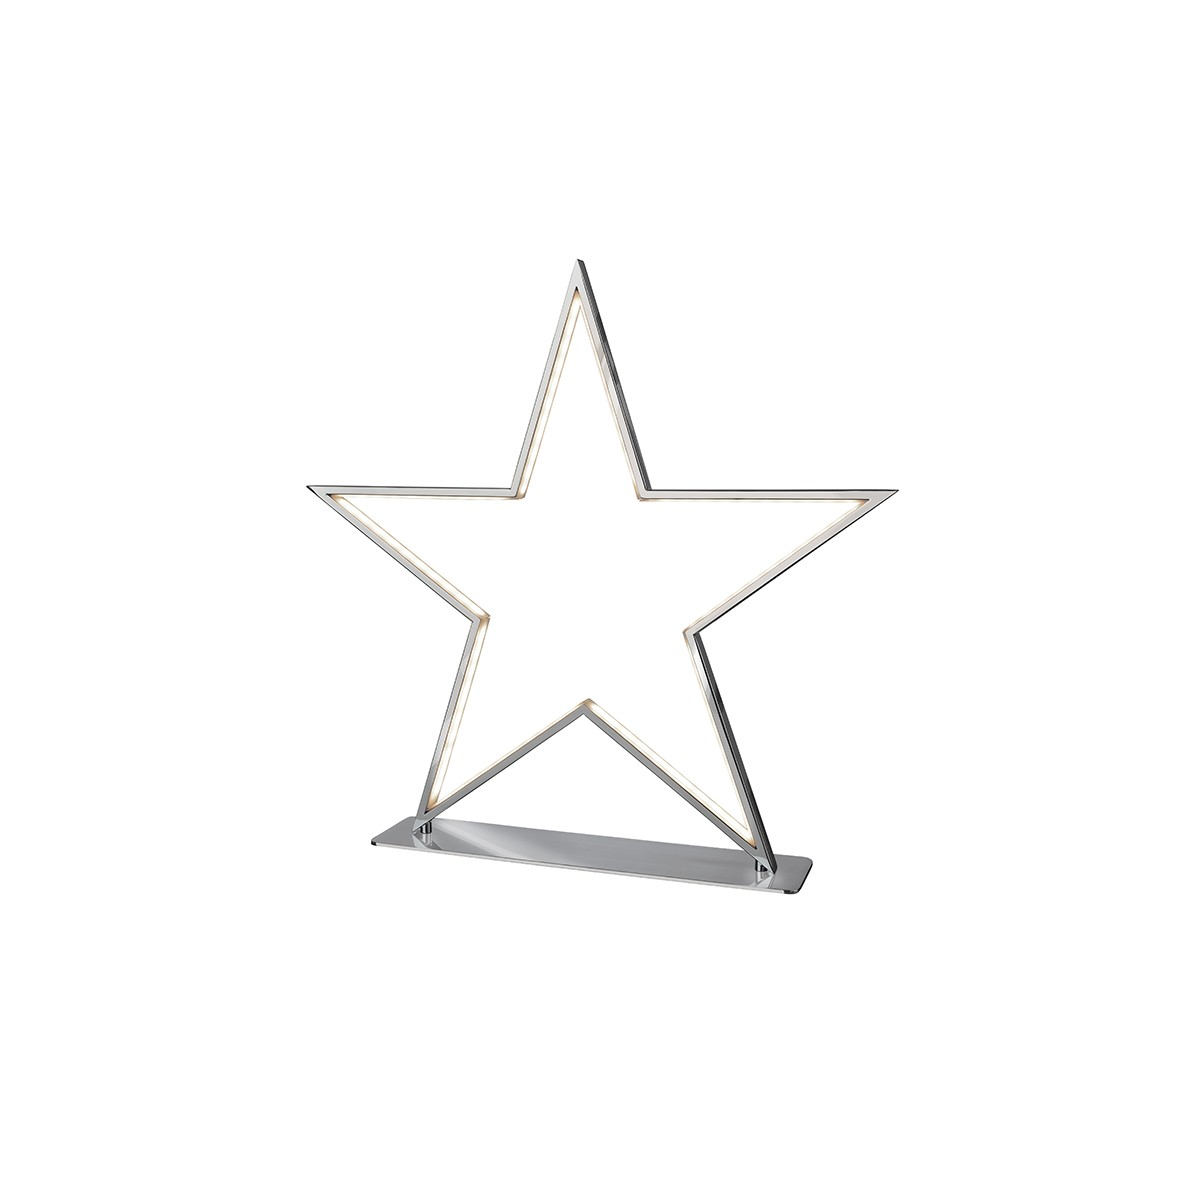 Sompex Lucy LED Tischleuchte, Höhe: 50 cm, Chrom